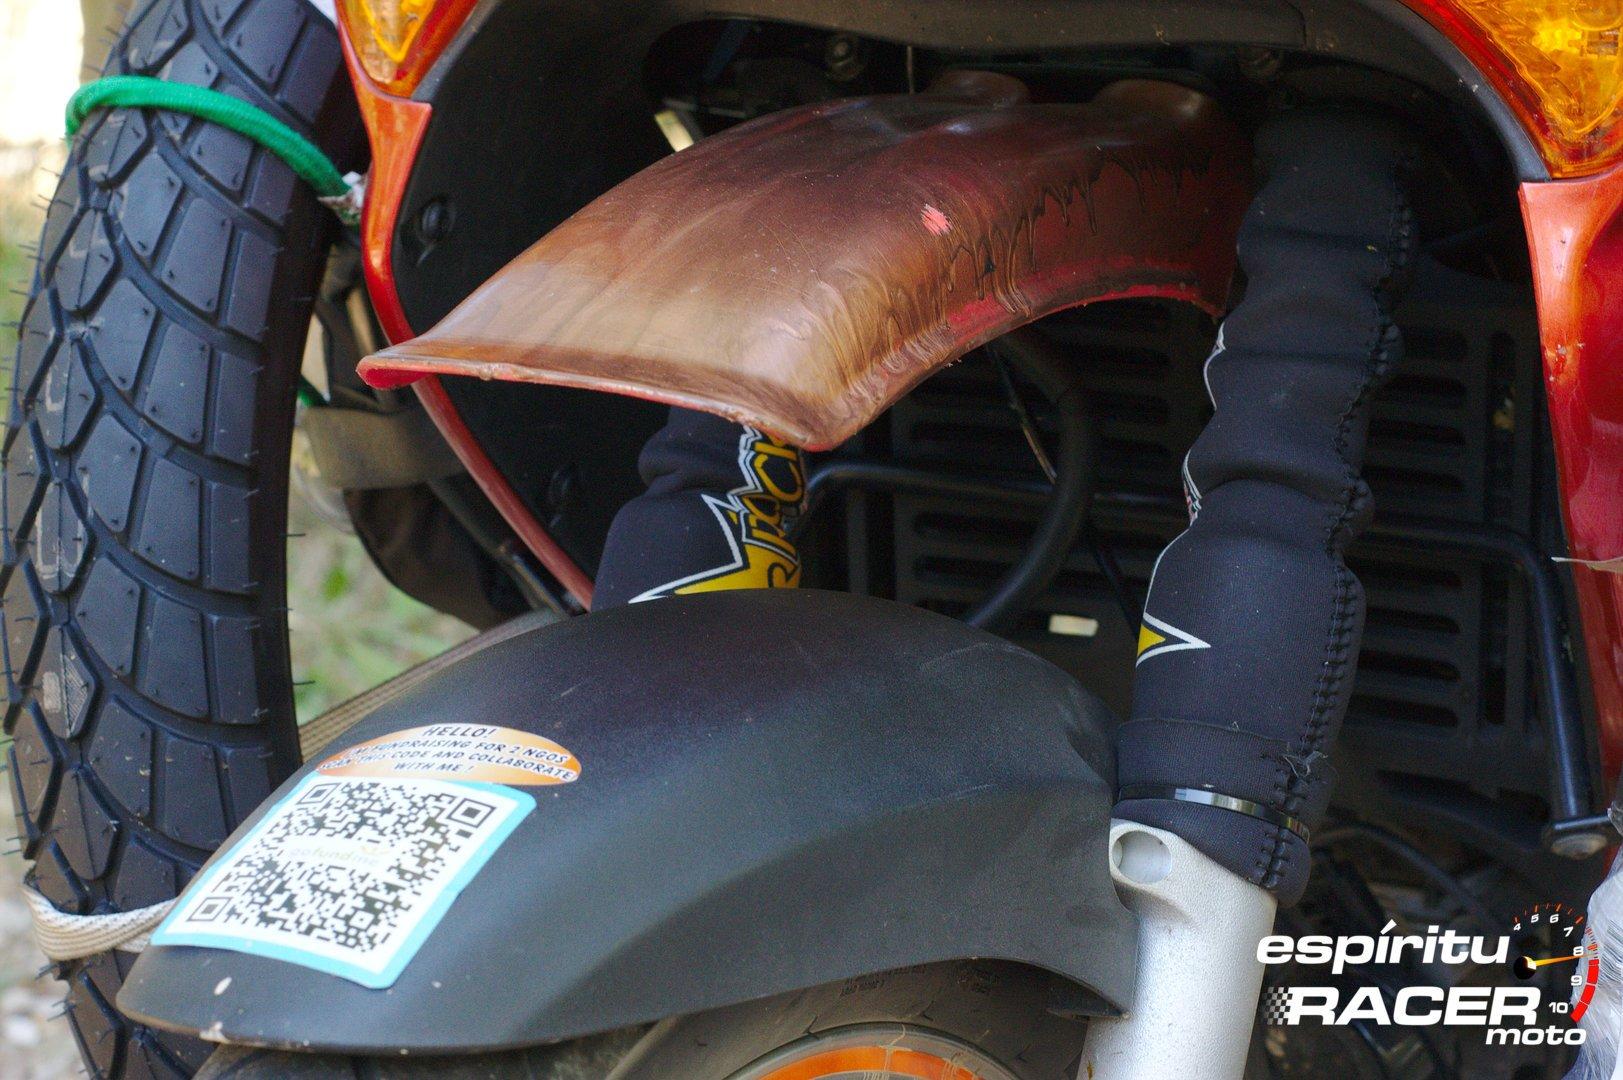 Pedro a Mongolia espirituRACER moto 24